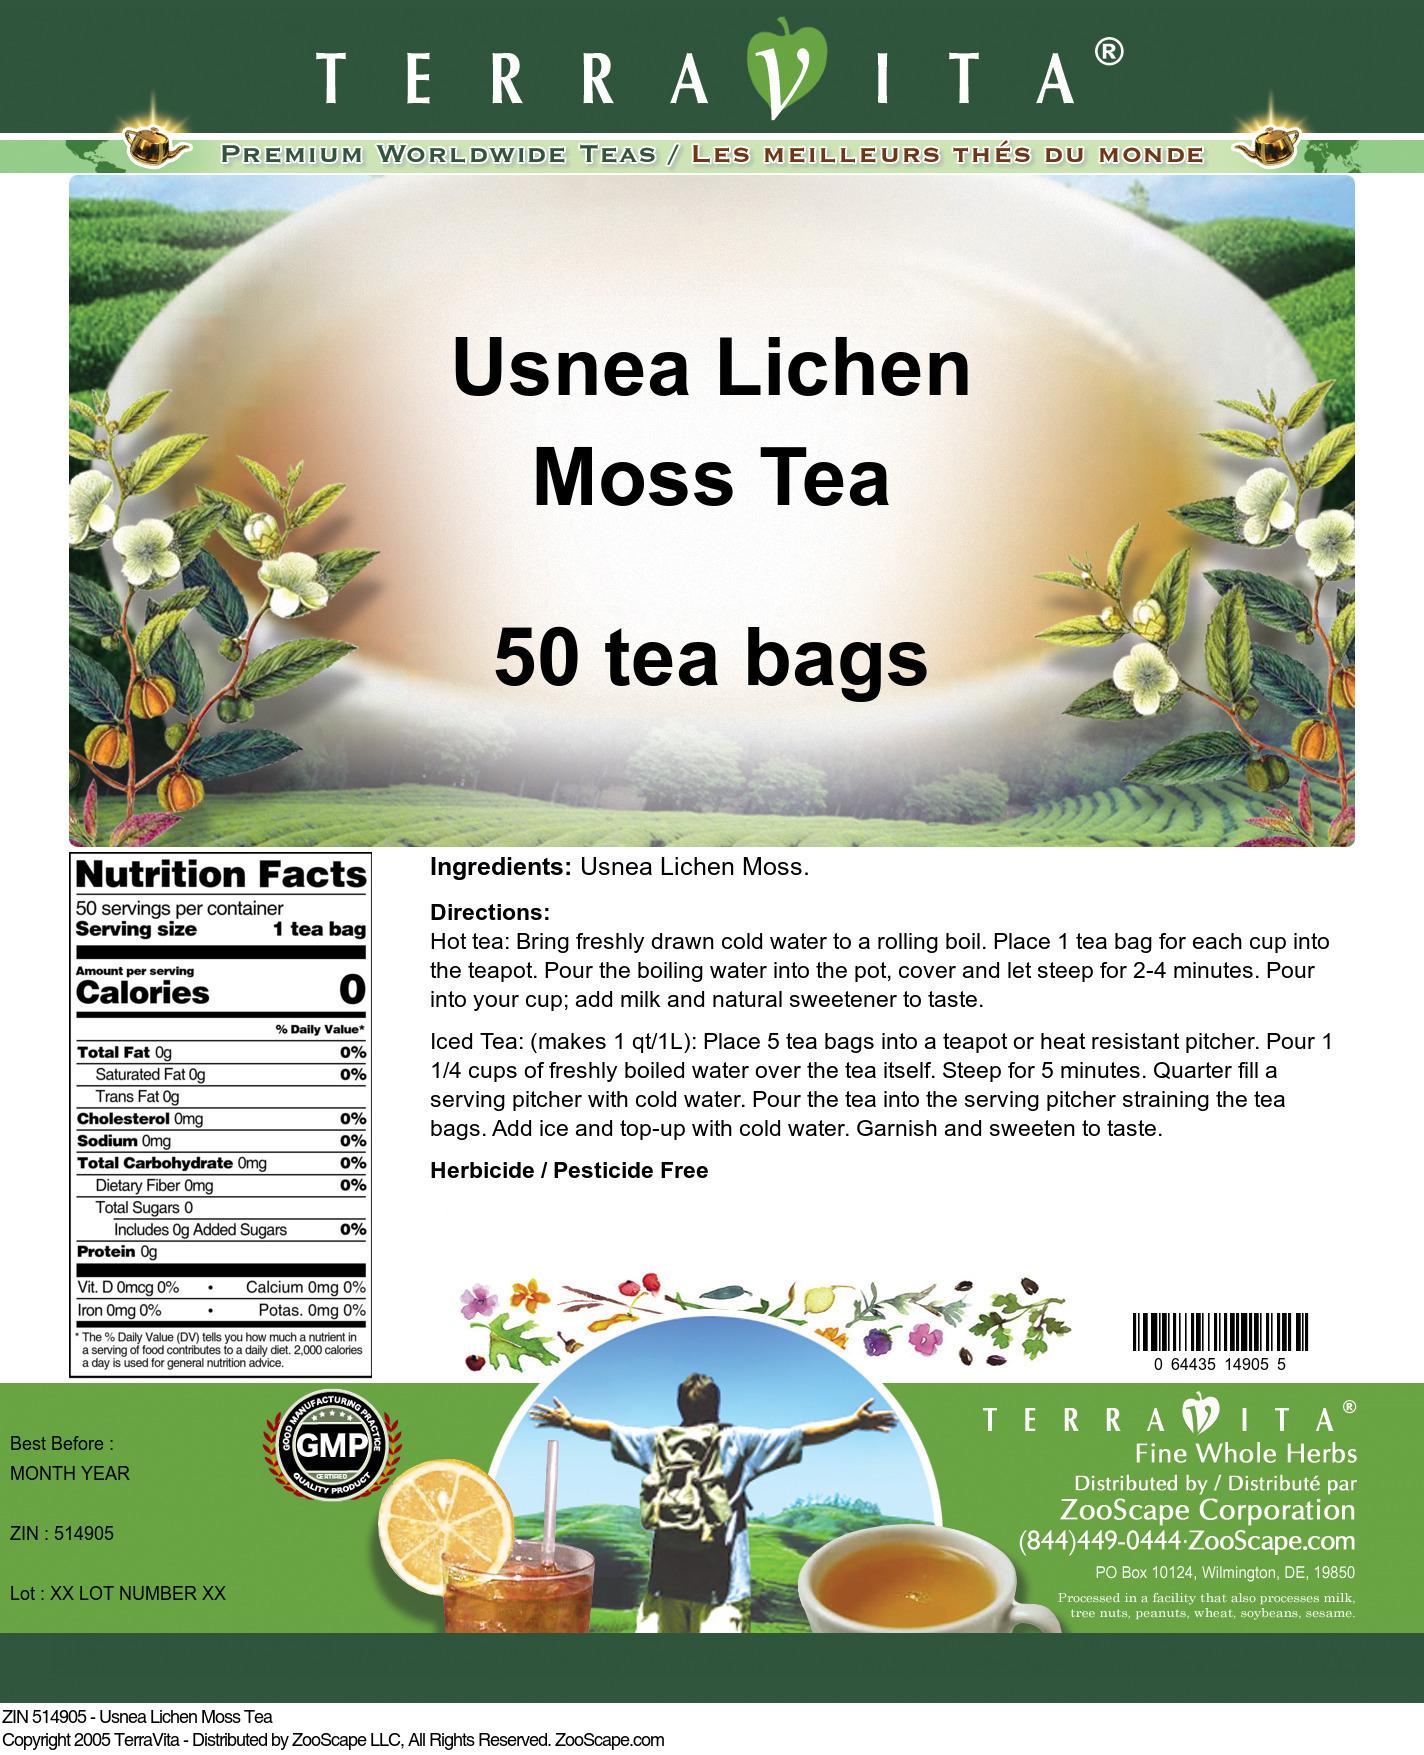 Usnea Lichen Moss Tea